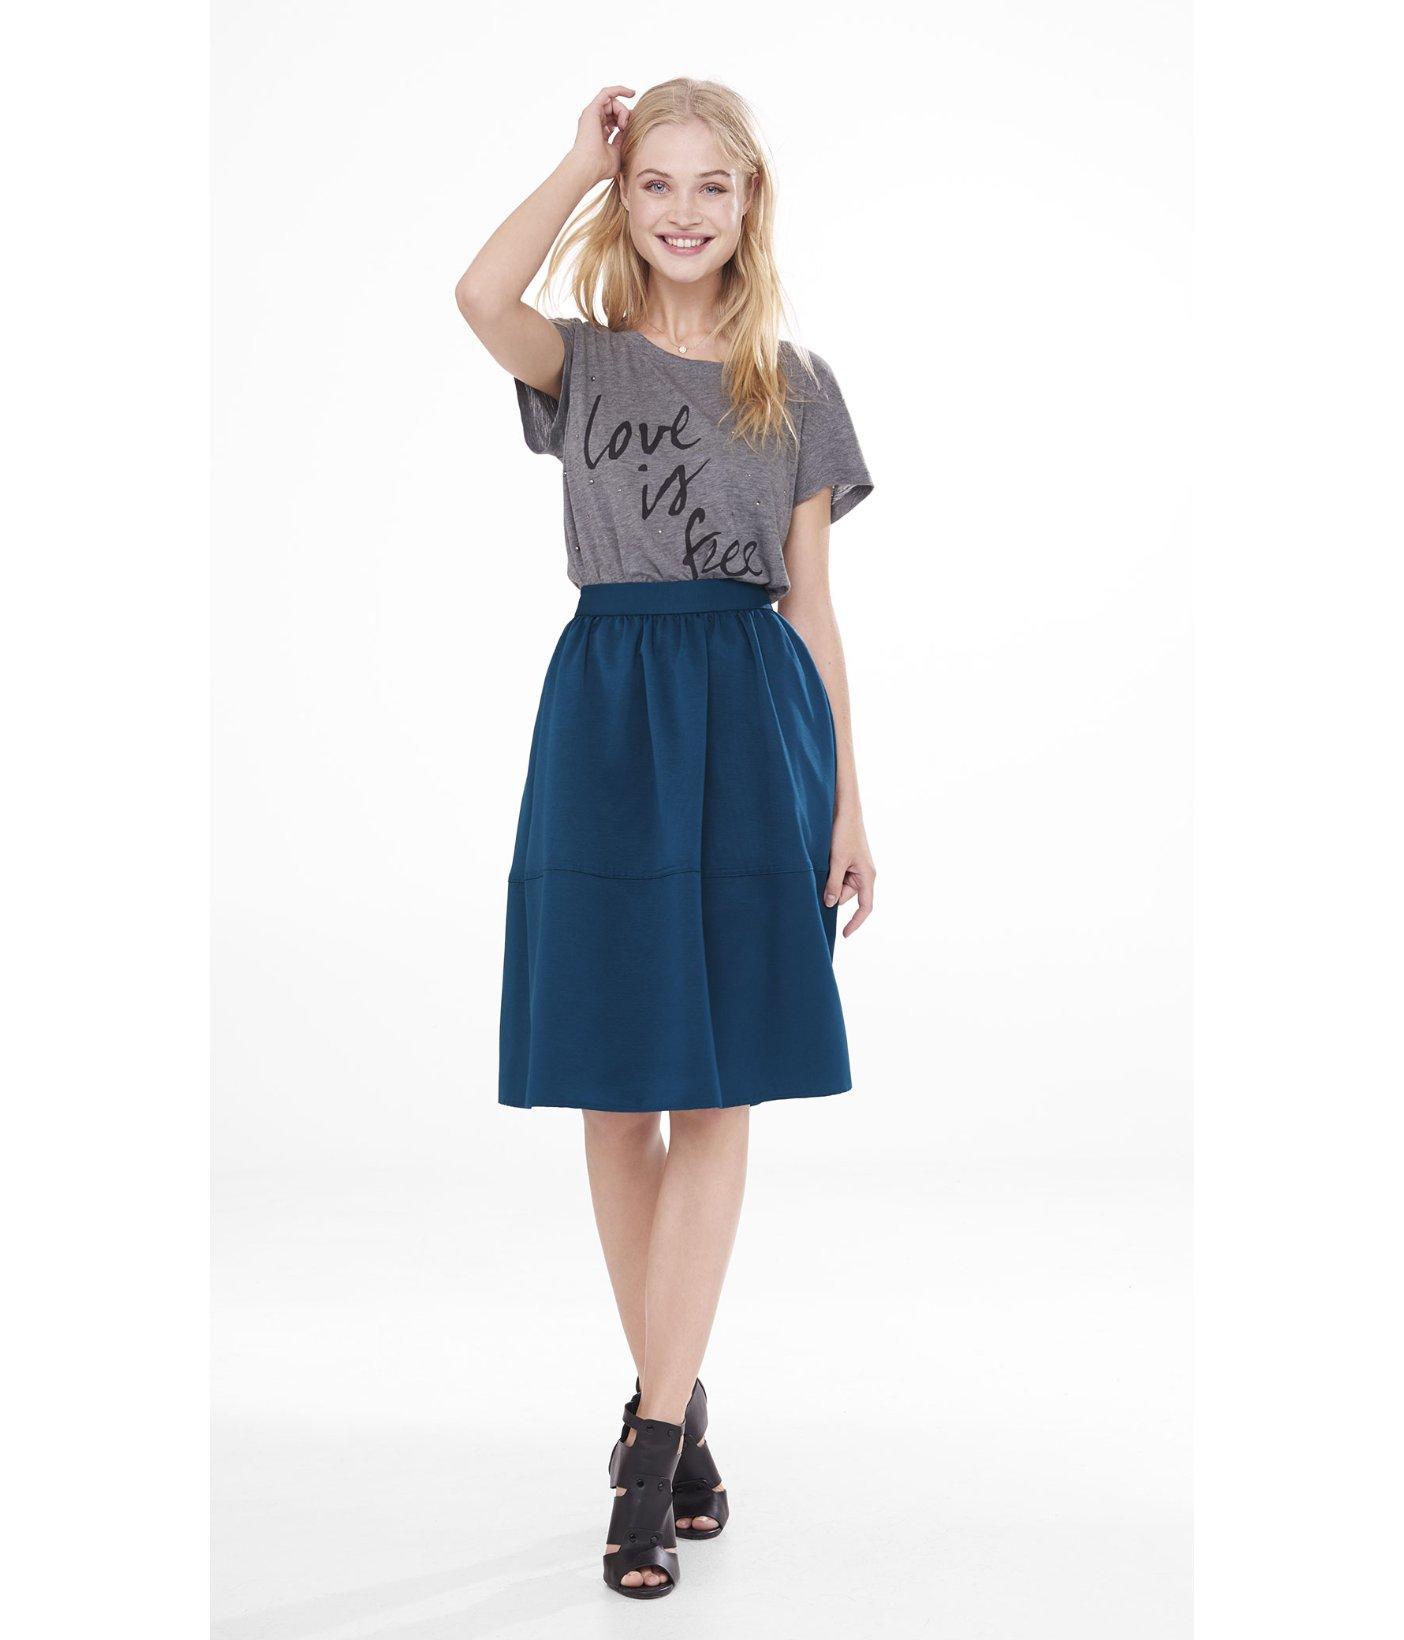 express teal high waist textured midi skirt in teal